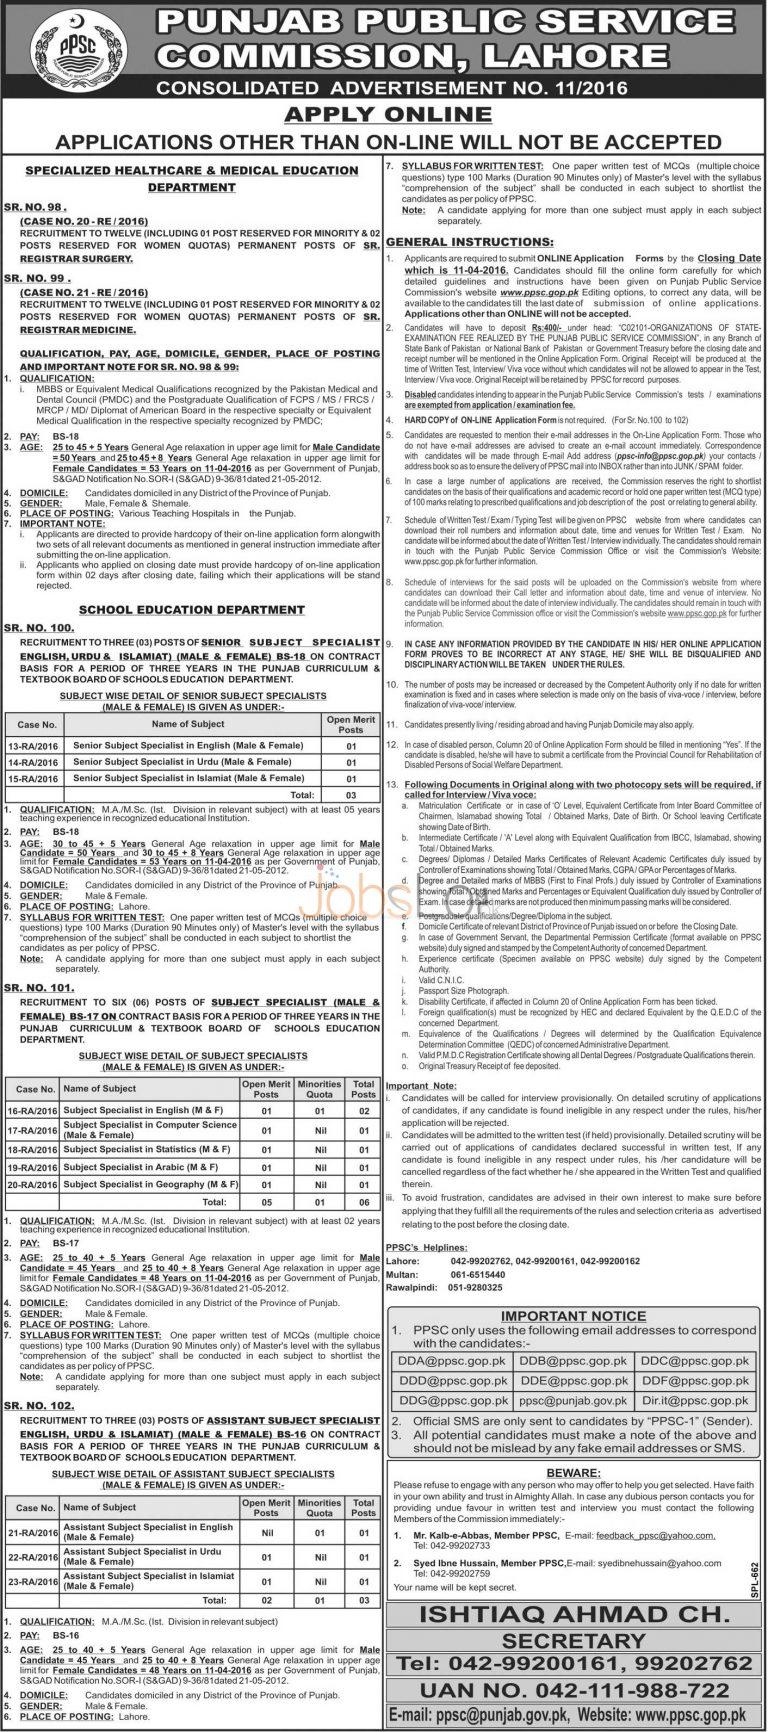 PPSC School Education Department Jobs 27 March 2016 Apply Online